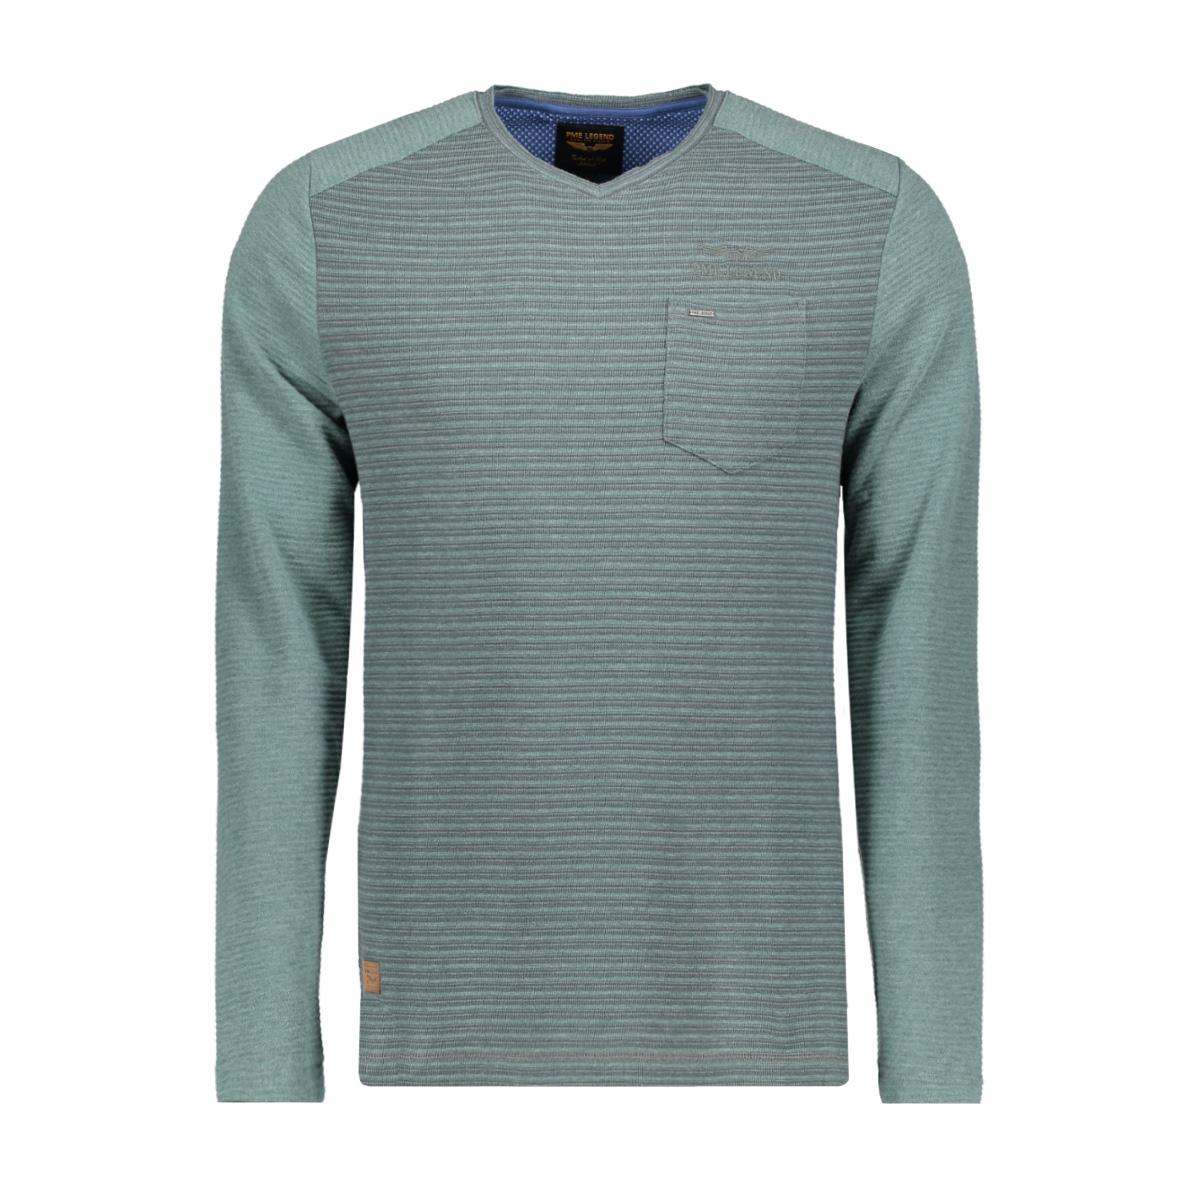 pts177512 pme legend t-shirt 601